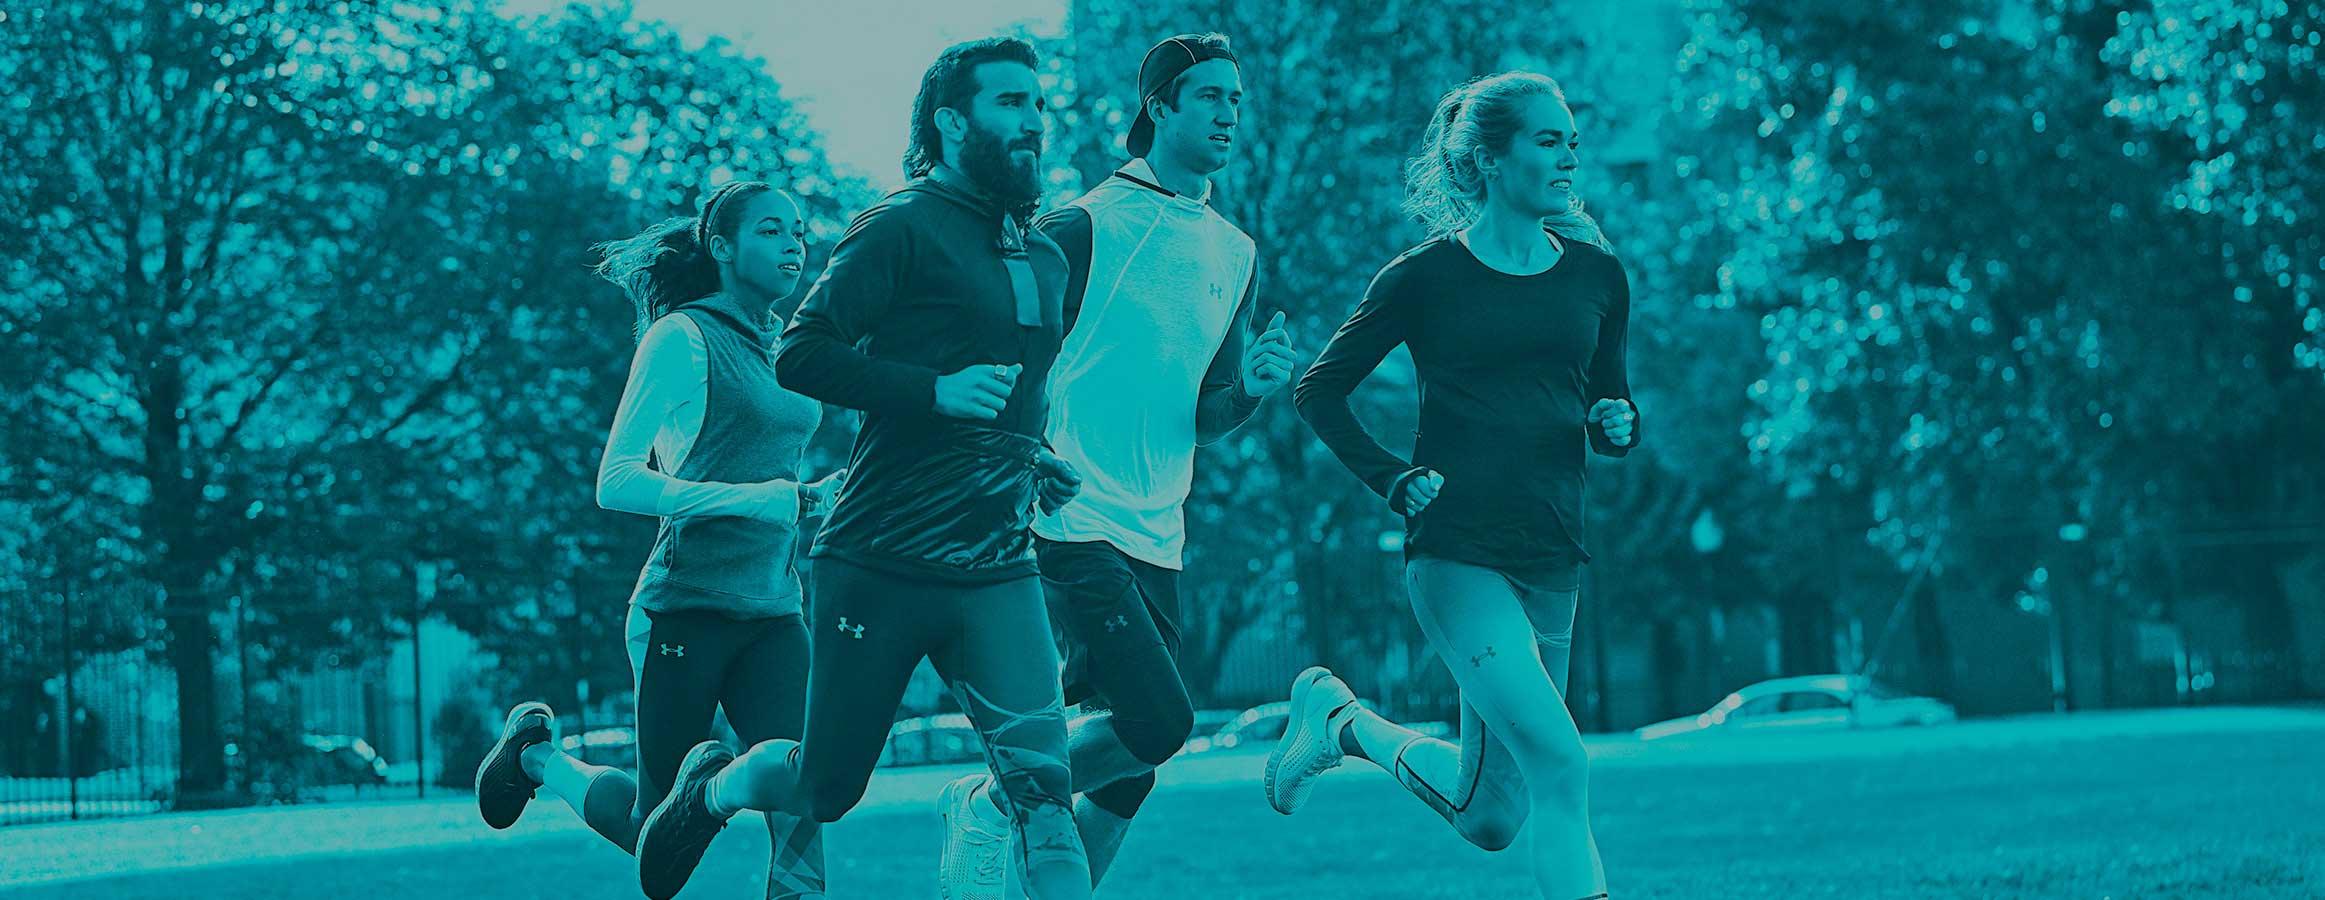 Negozio Running Online | Mister Running Shop